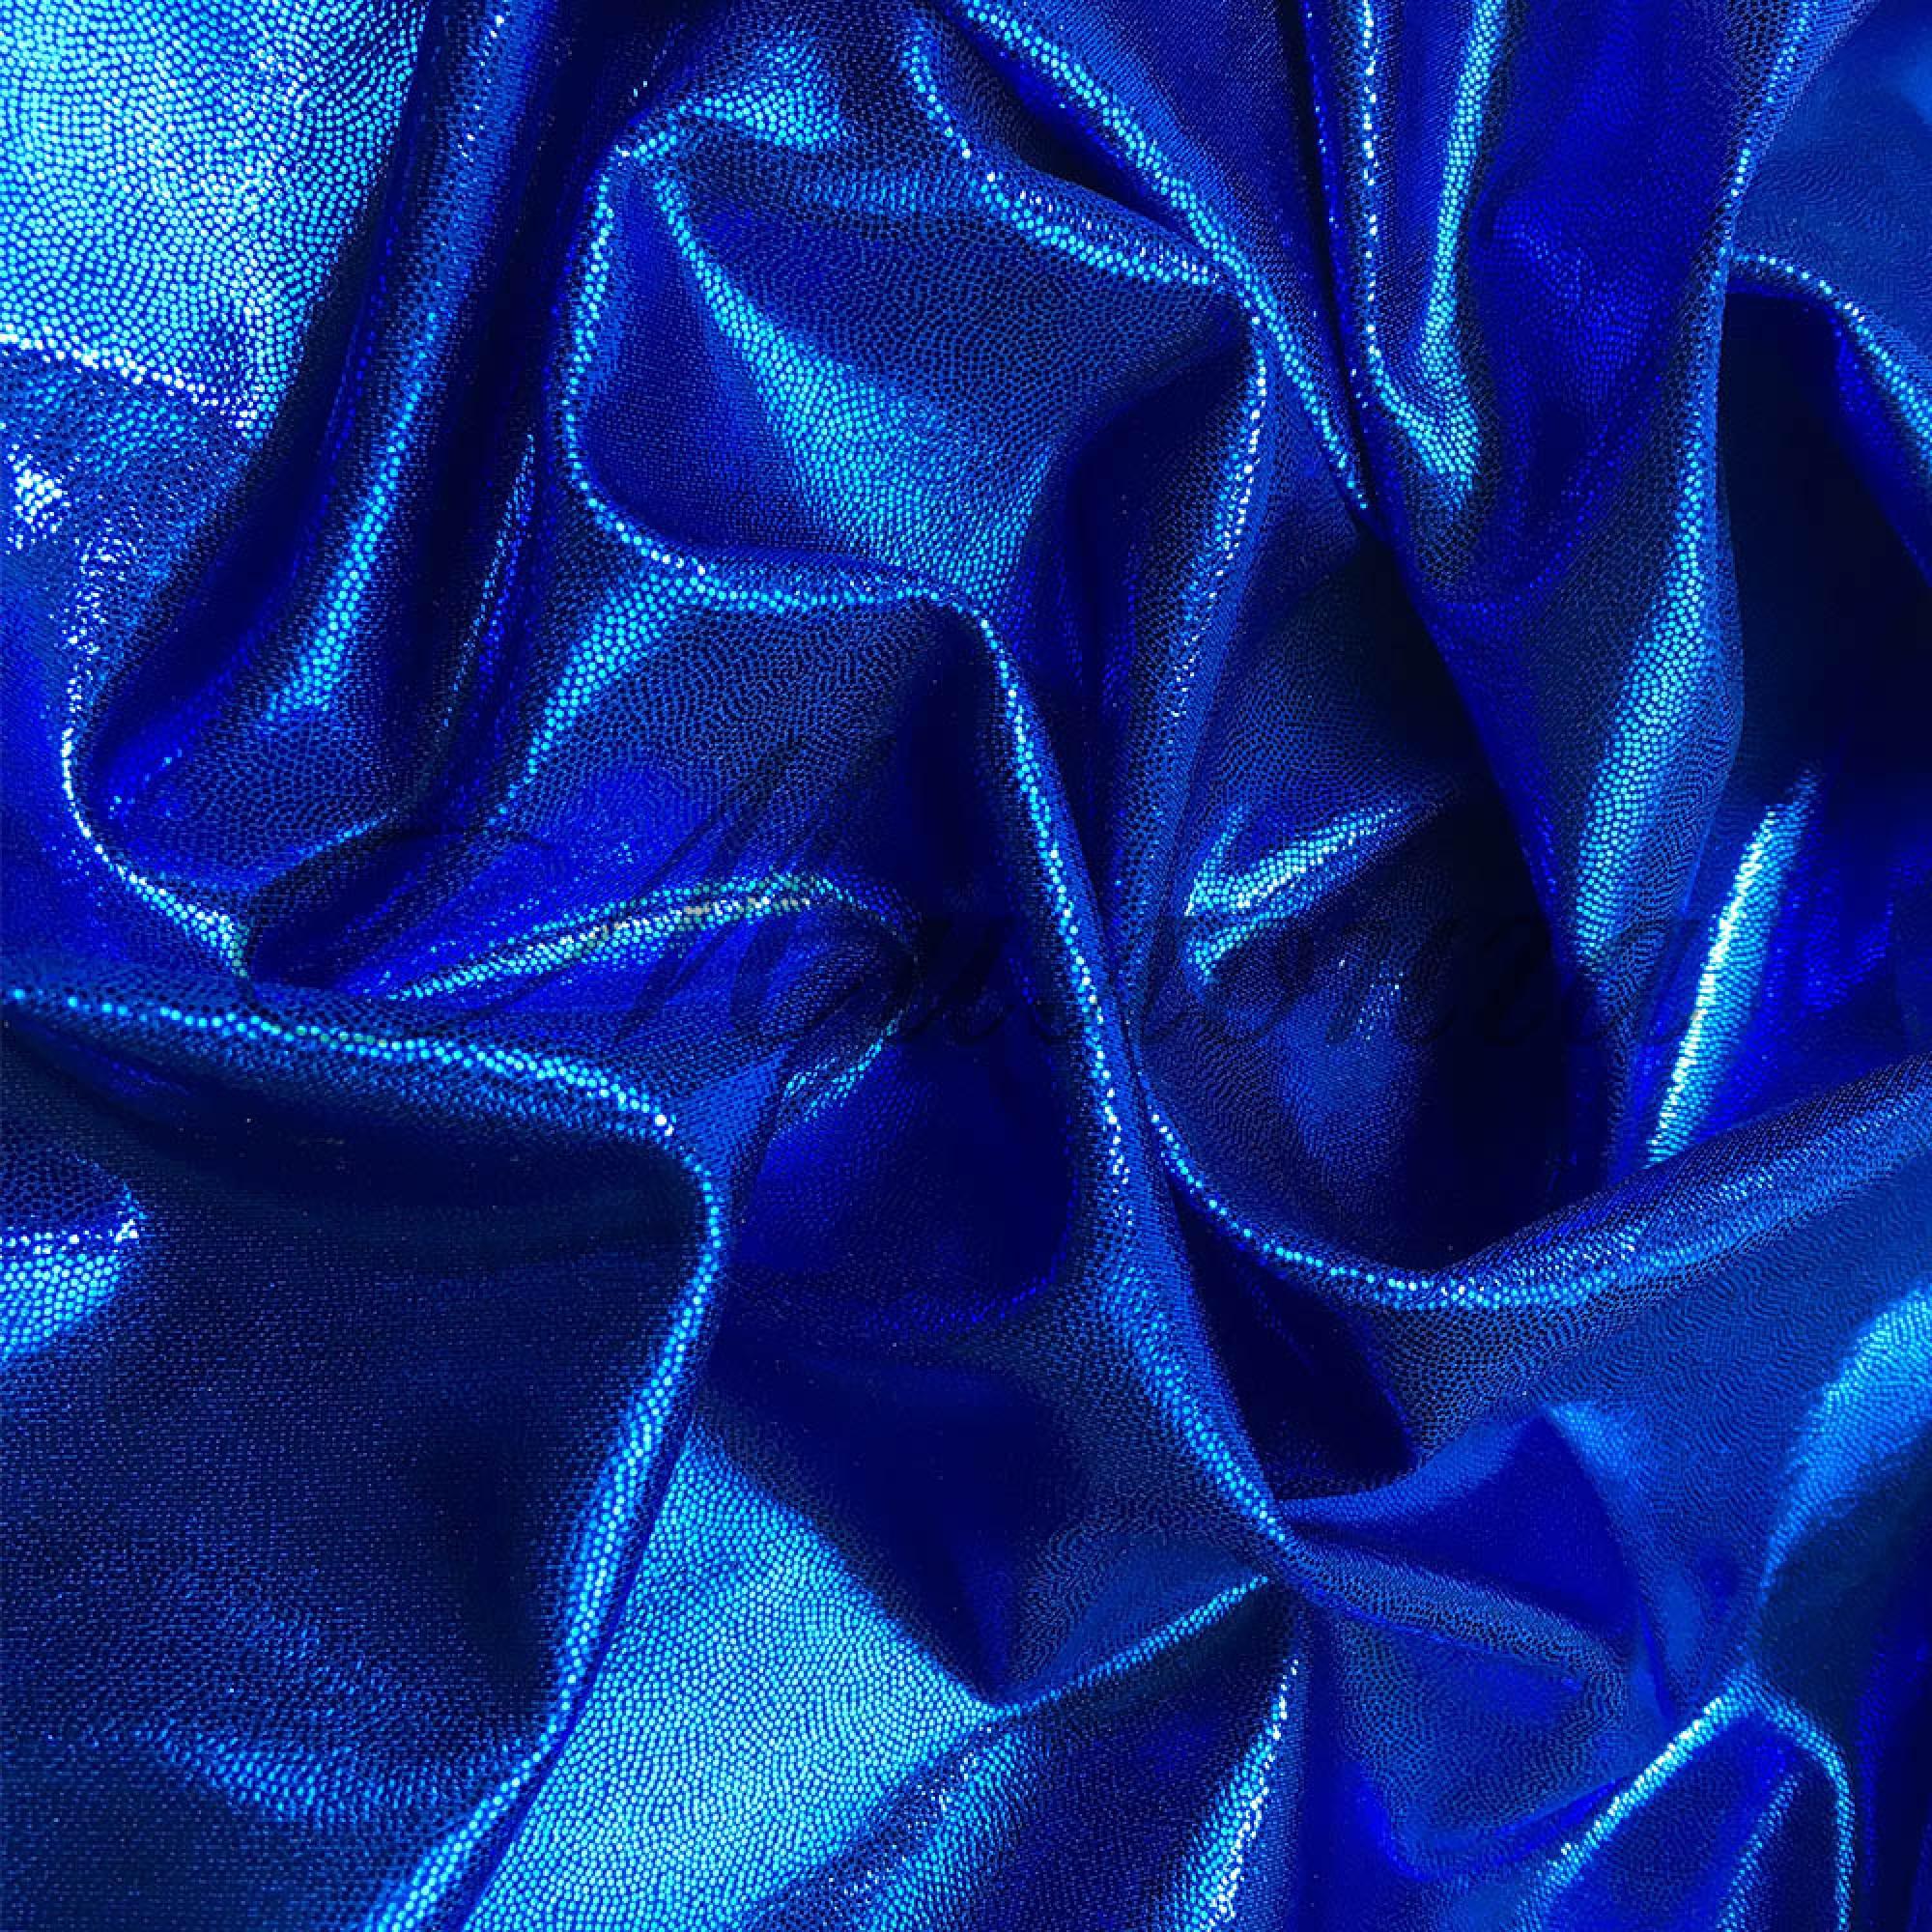 Лайкра Chrisanne DotShine Electric Blue on Blue